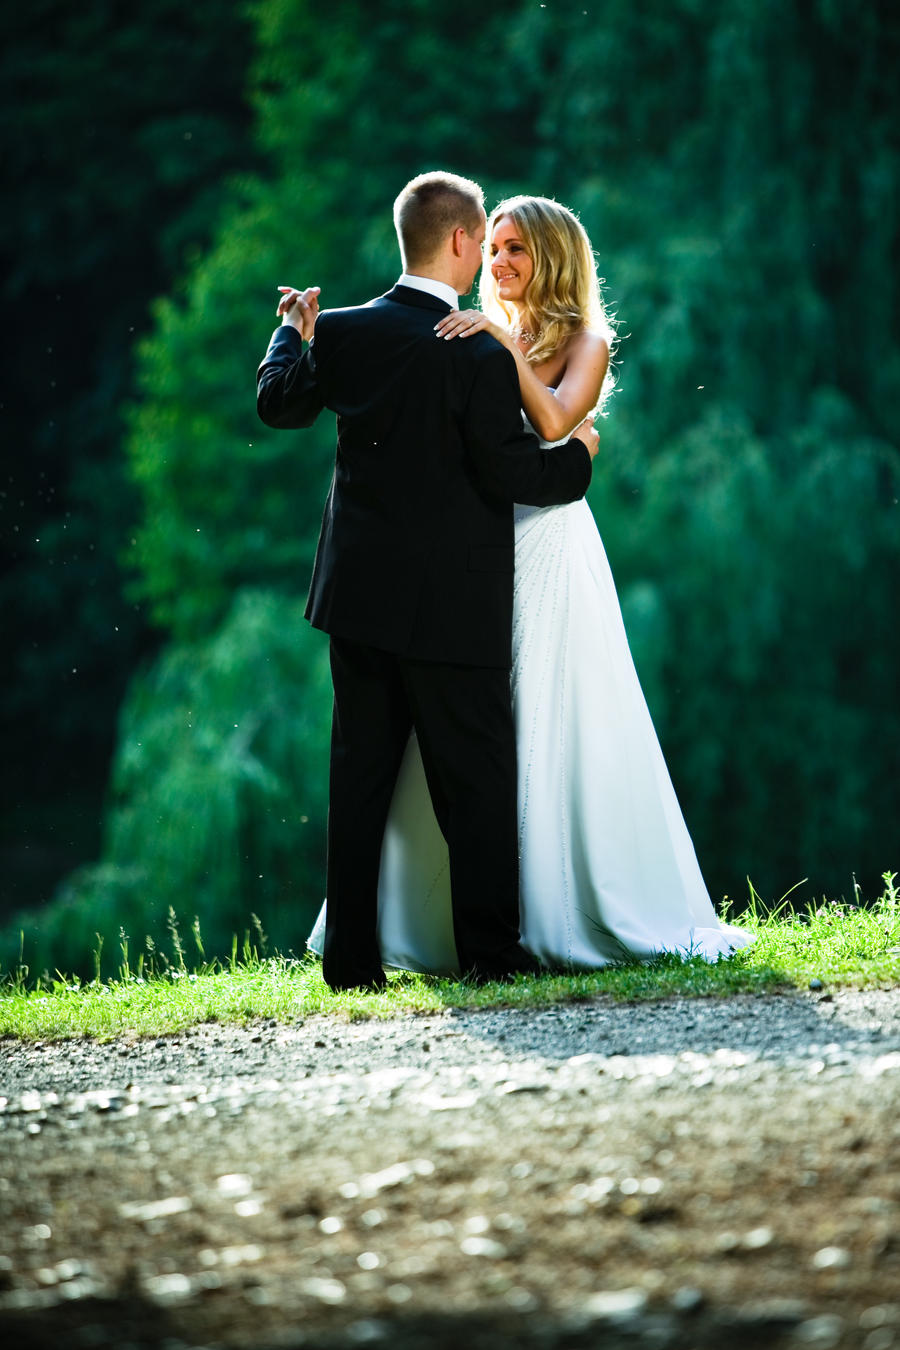 wedding 12 by kechake stock on deviantart On free wedding stock photos